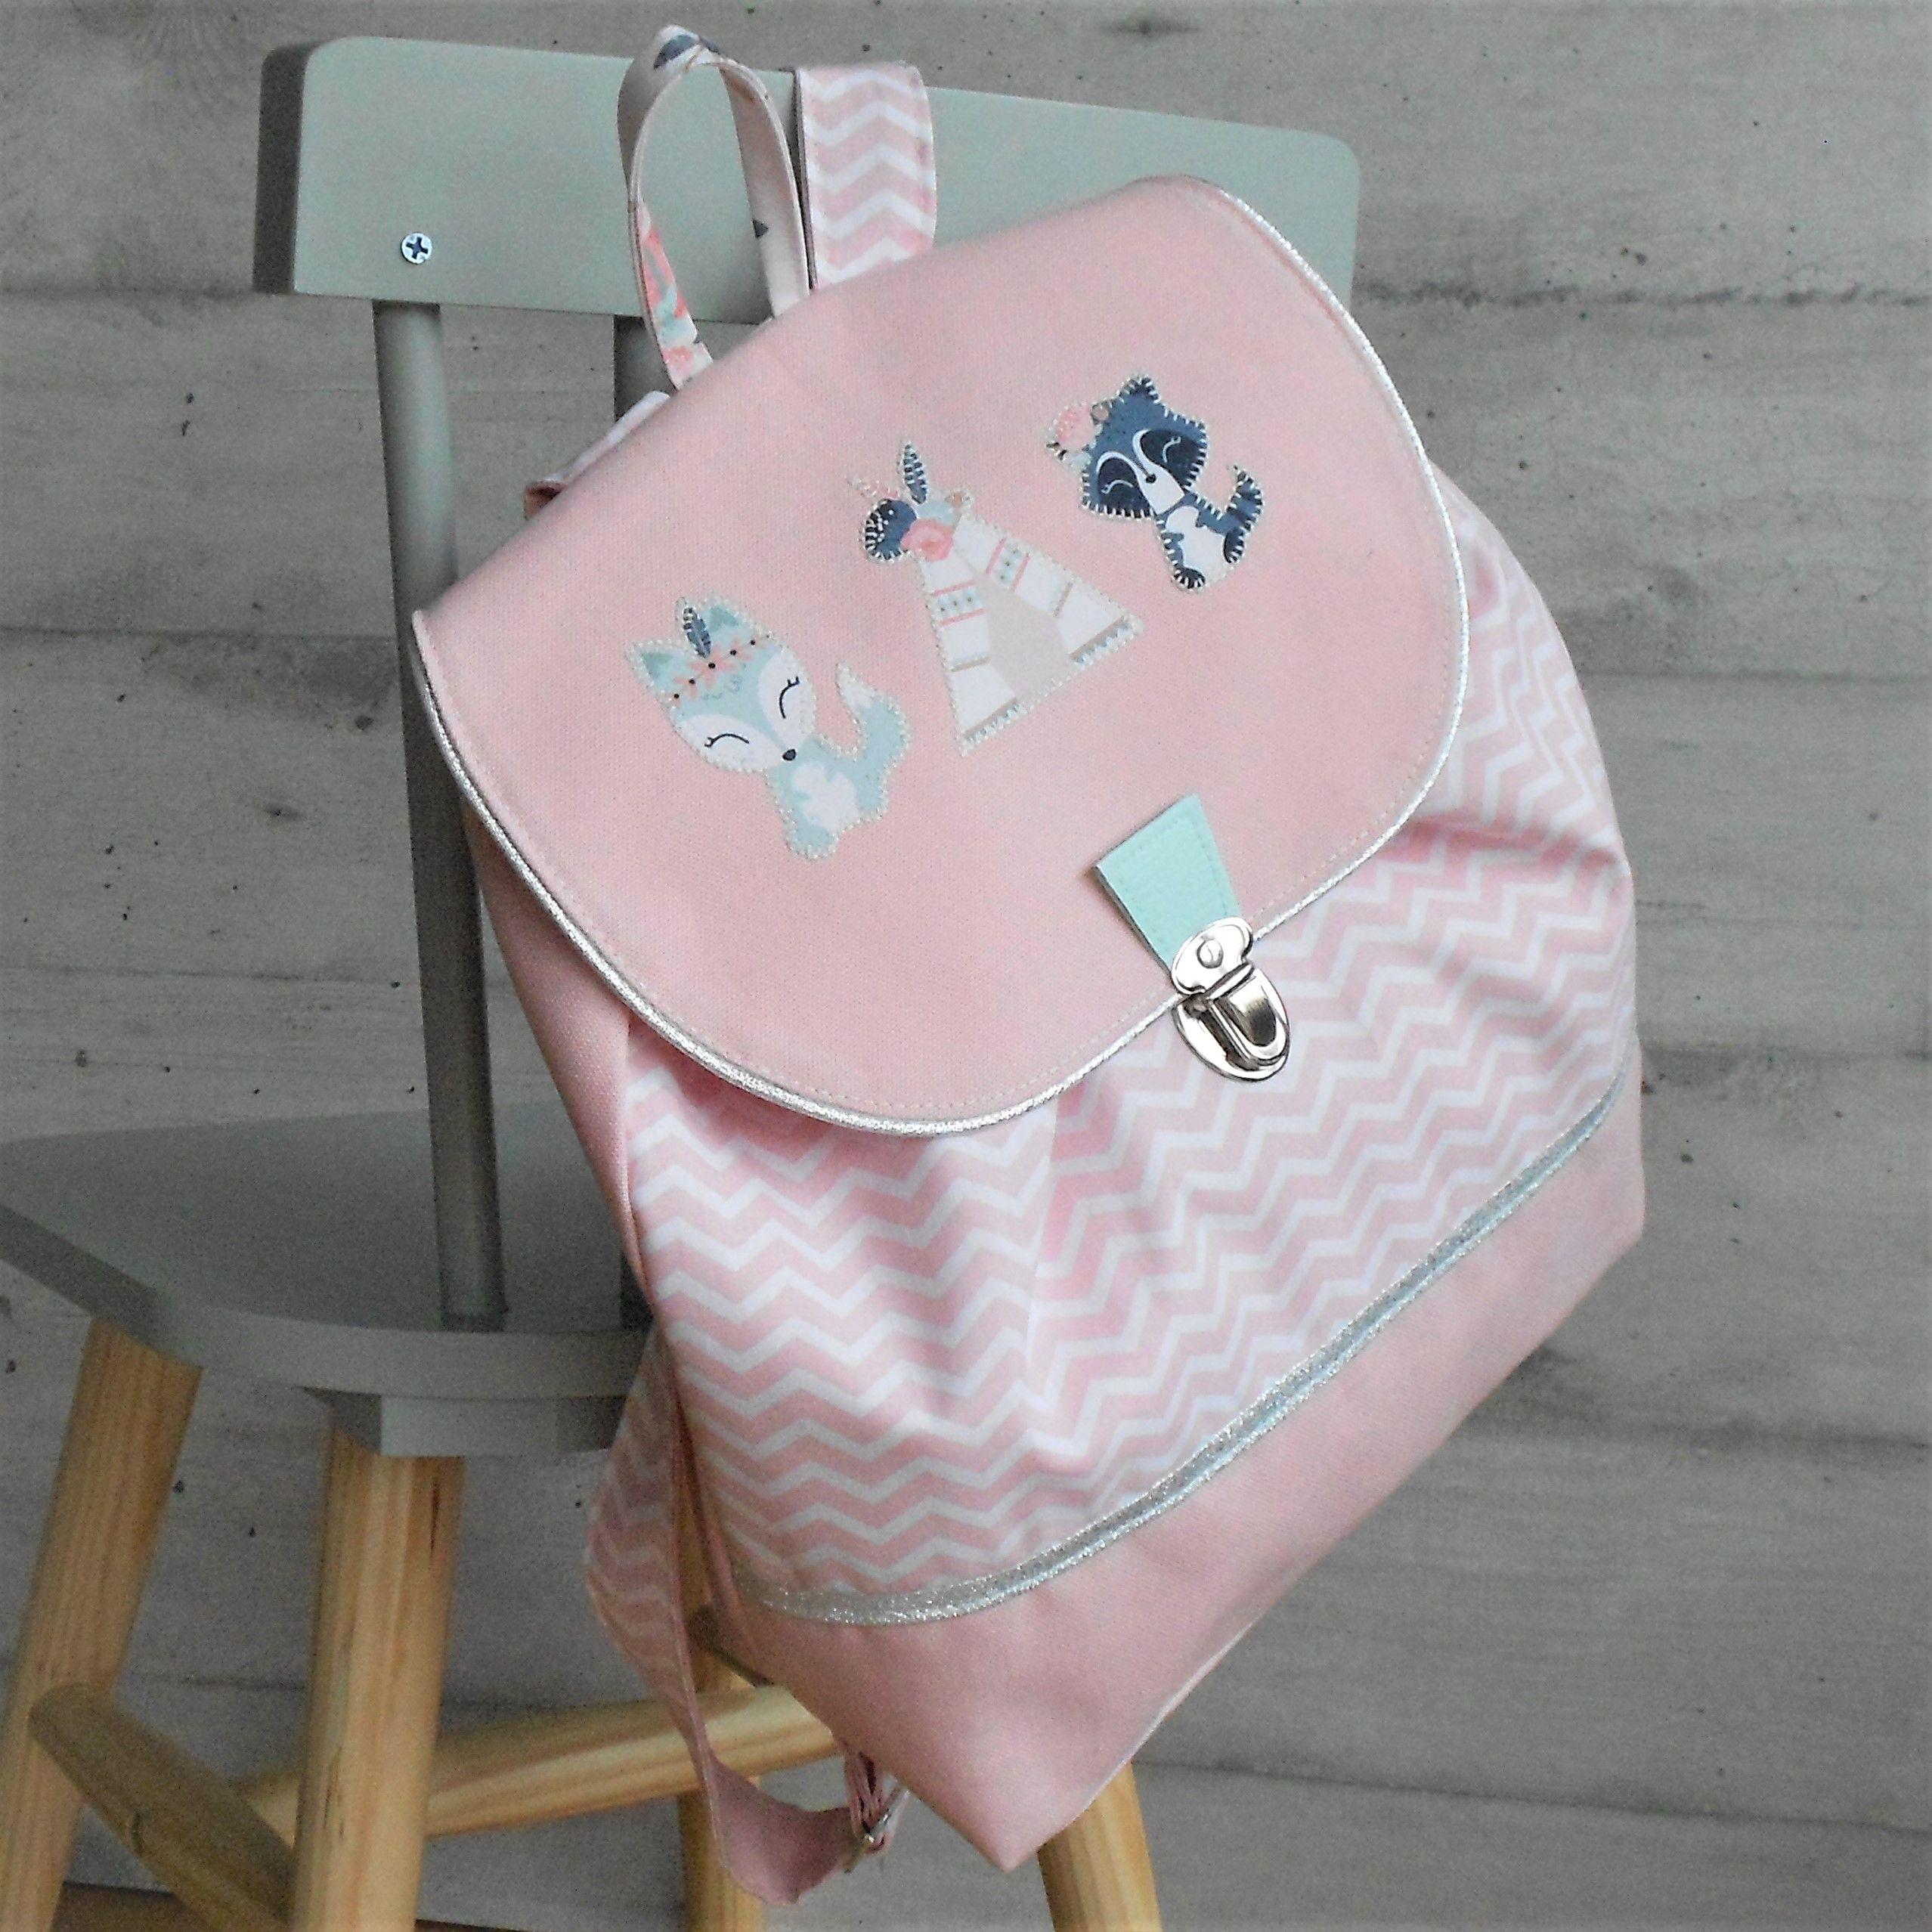 Sac A Dos Enfant Sac A Dos Maternelle Sac A Dos Personnalise Cartable Maternelle Ideal Pour L Entree En Maternelle Ou La C In 2020 Bags Backpacks Leather Backpack